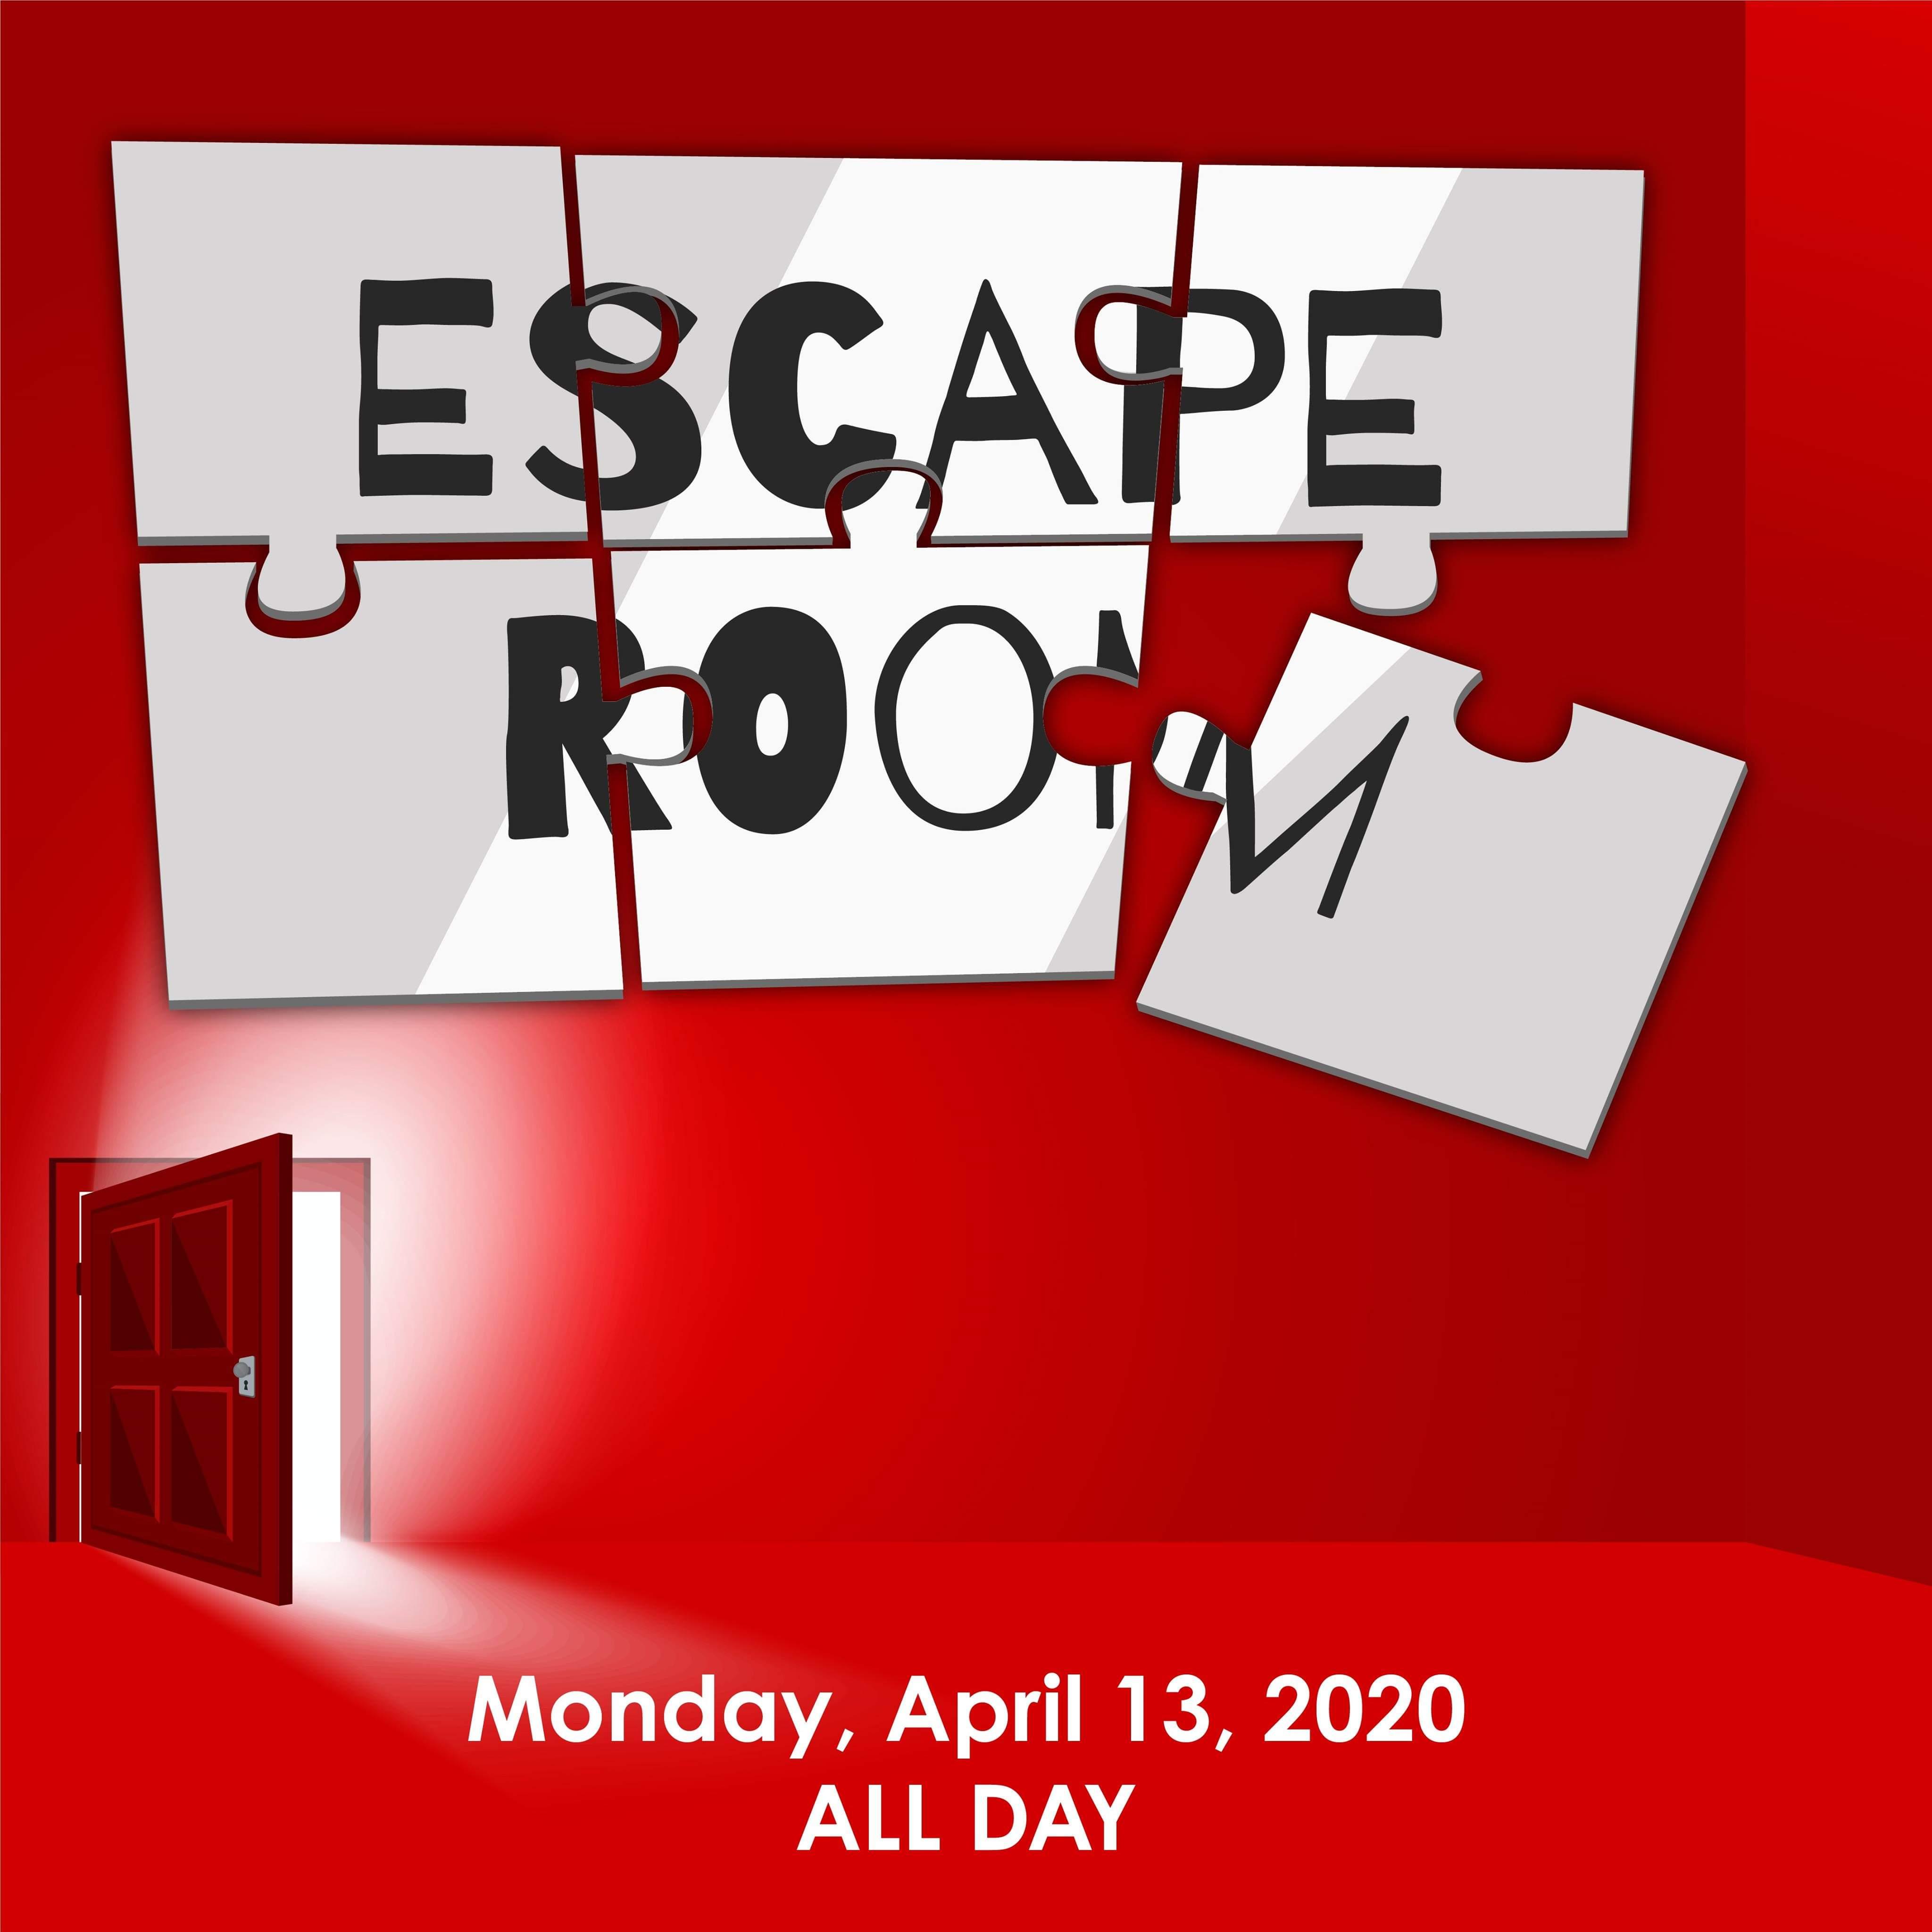 Image of Escape Room Event